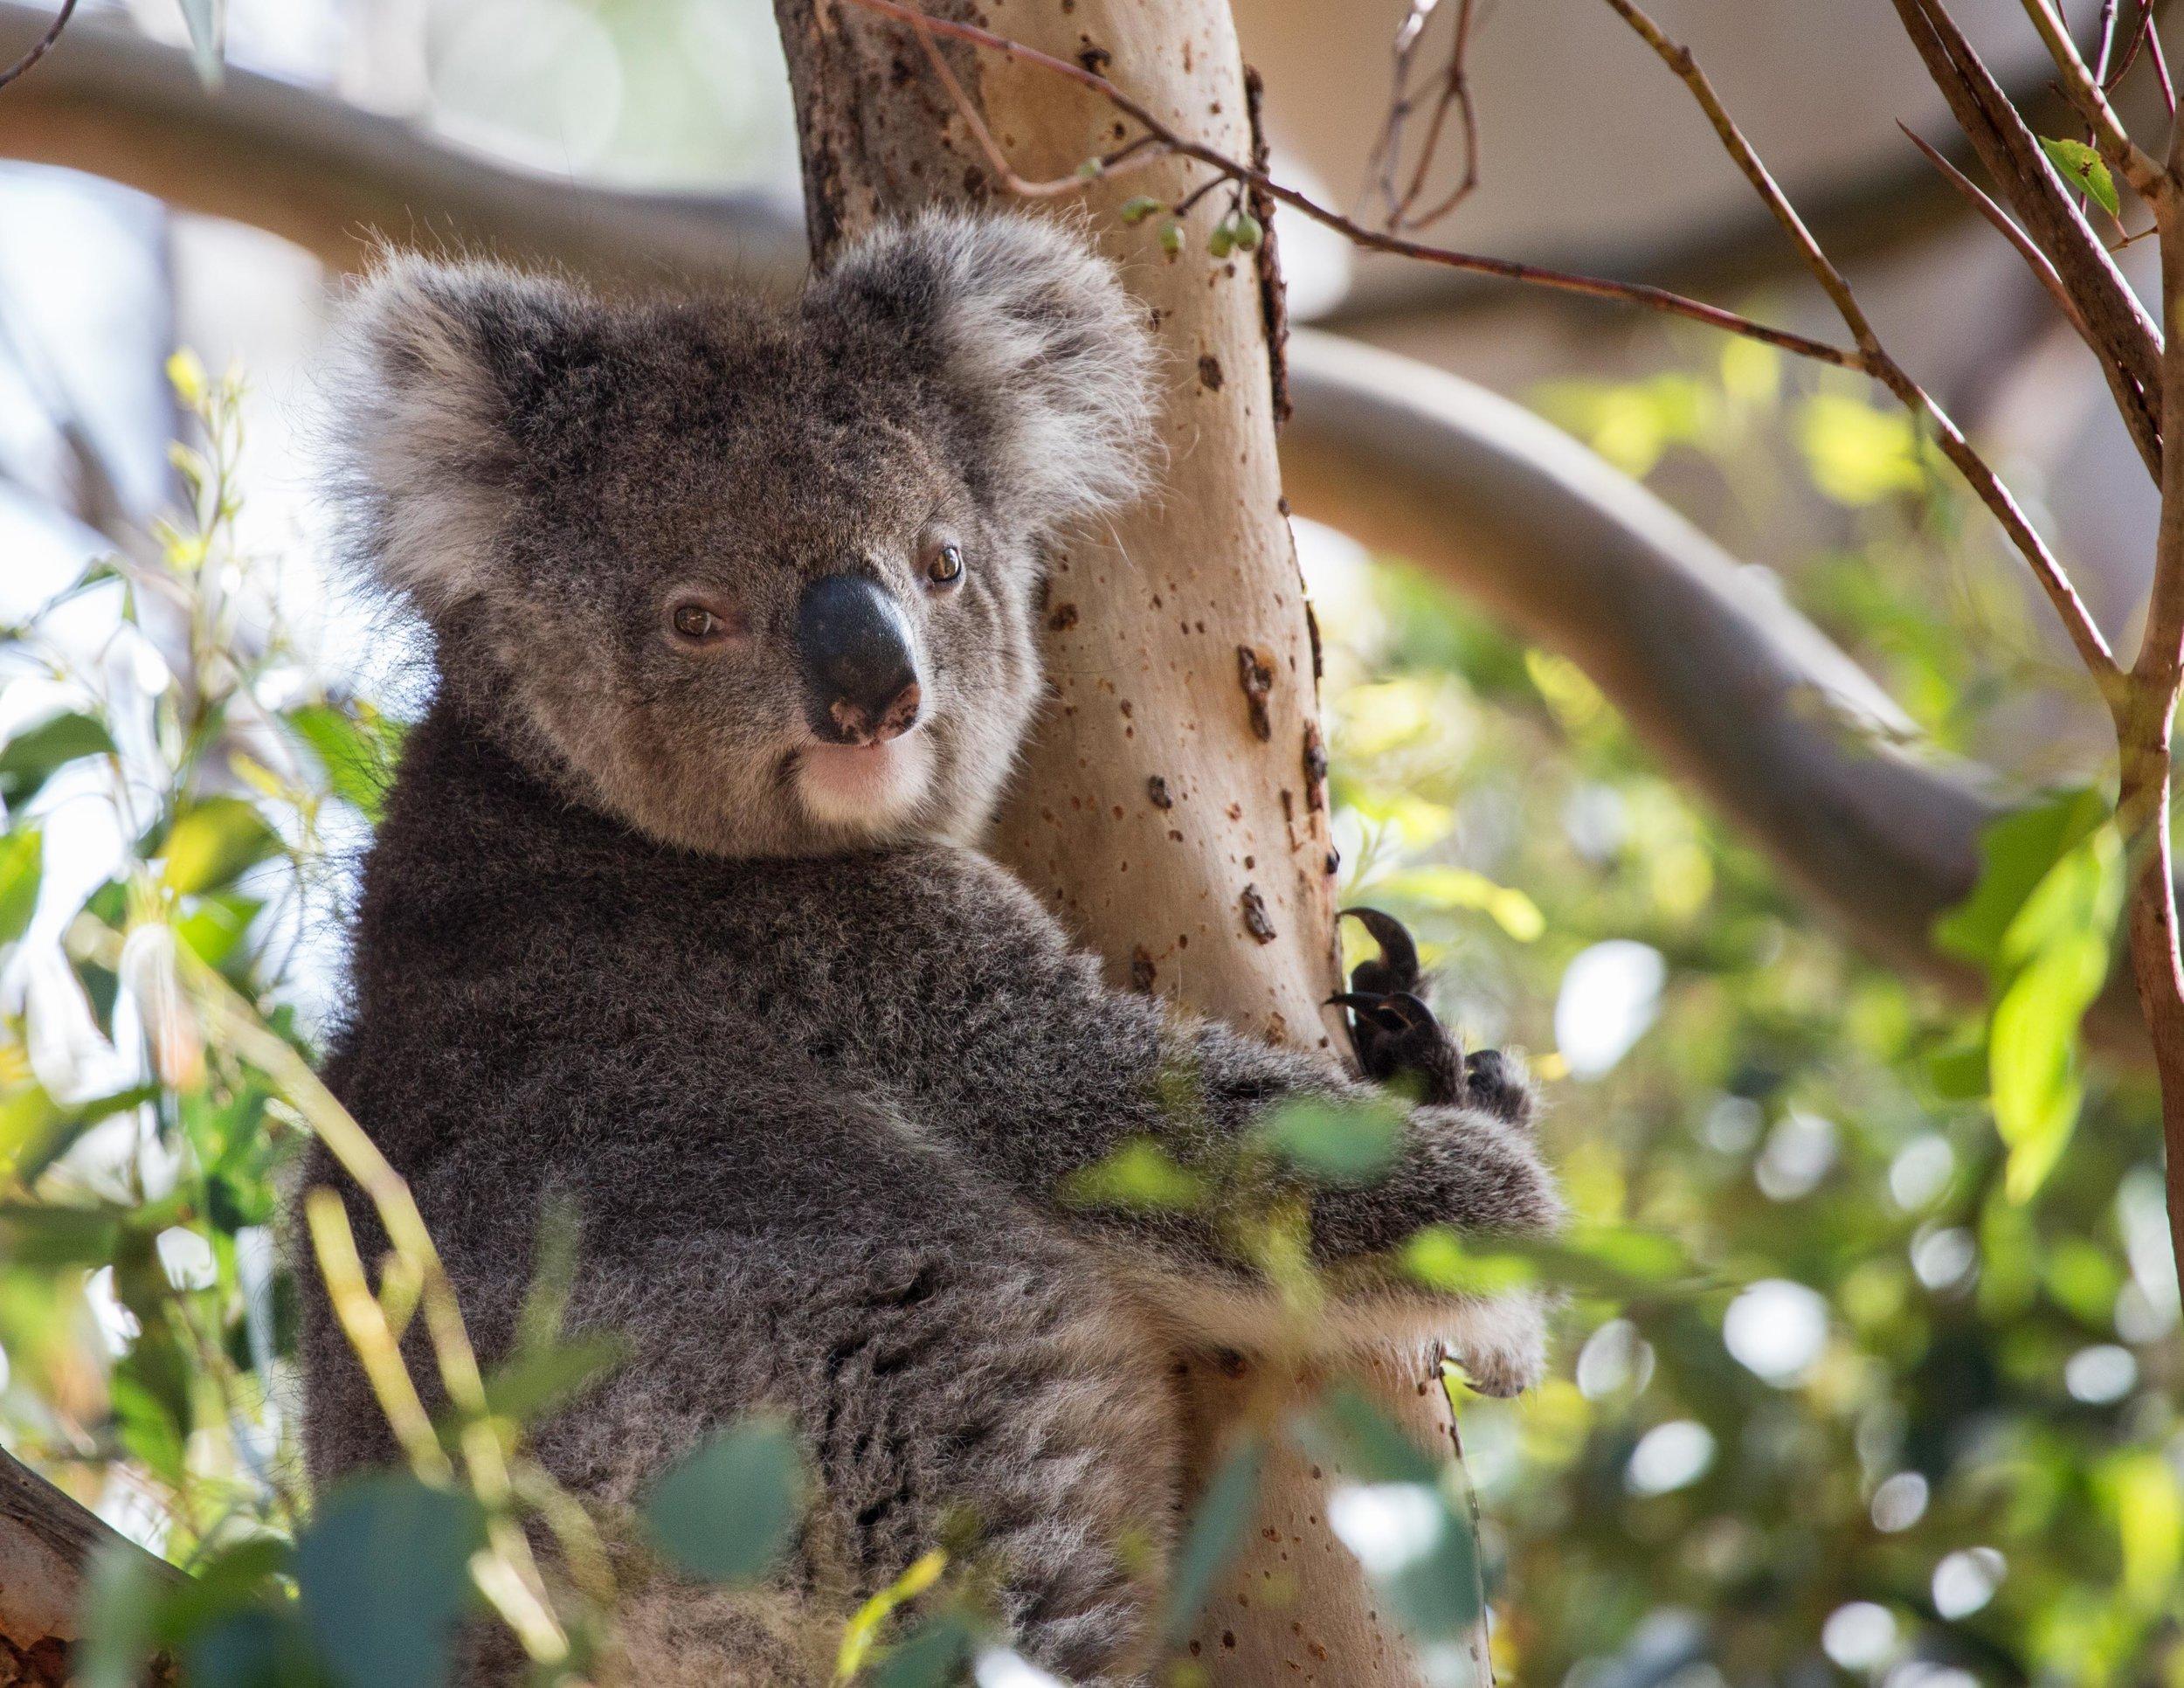 Tidbinbilla Reserve, Where to see wild koalas in Australia